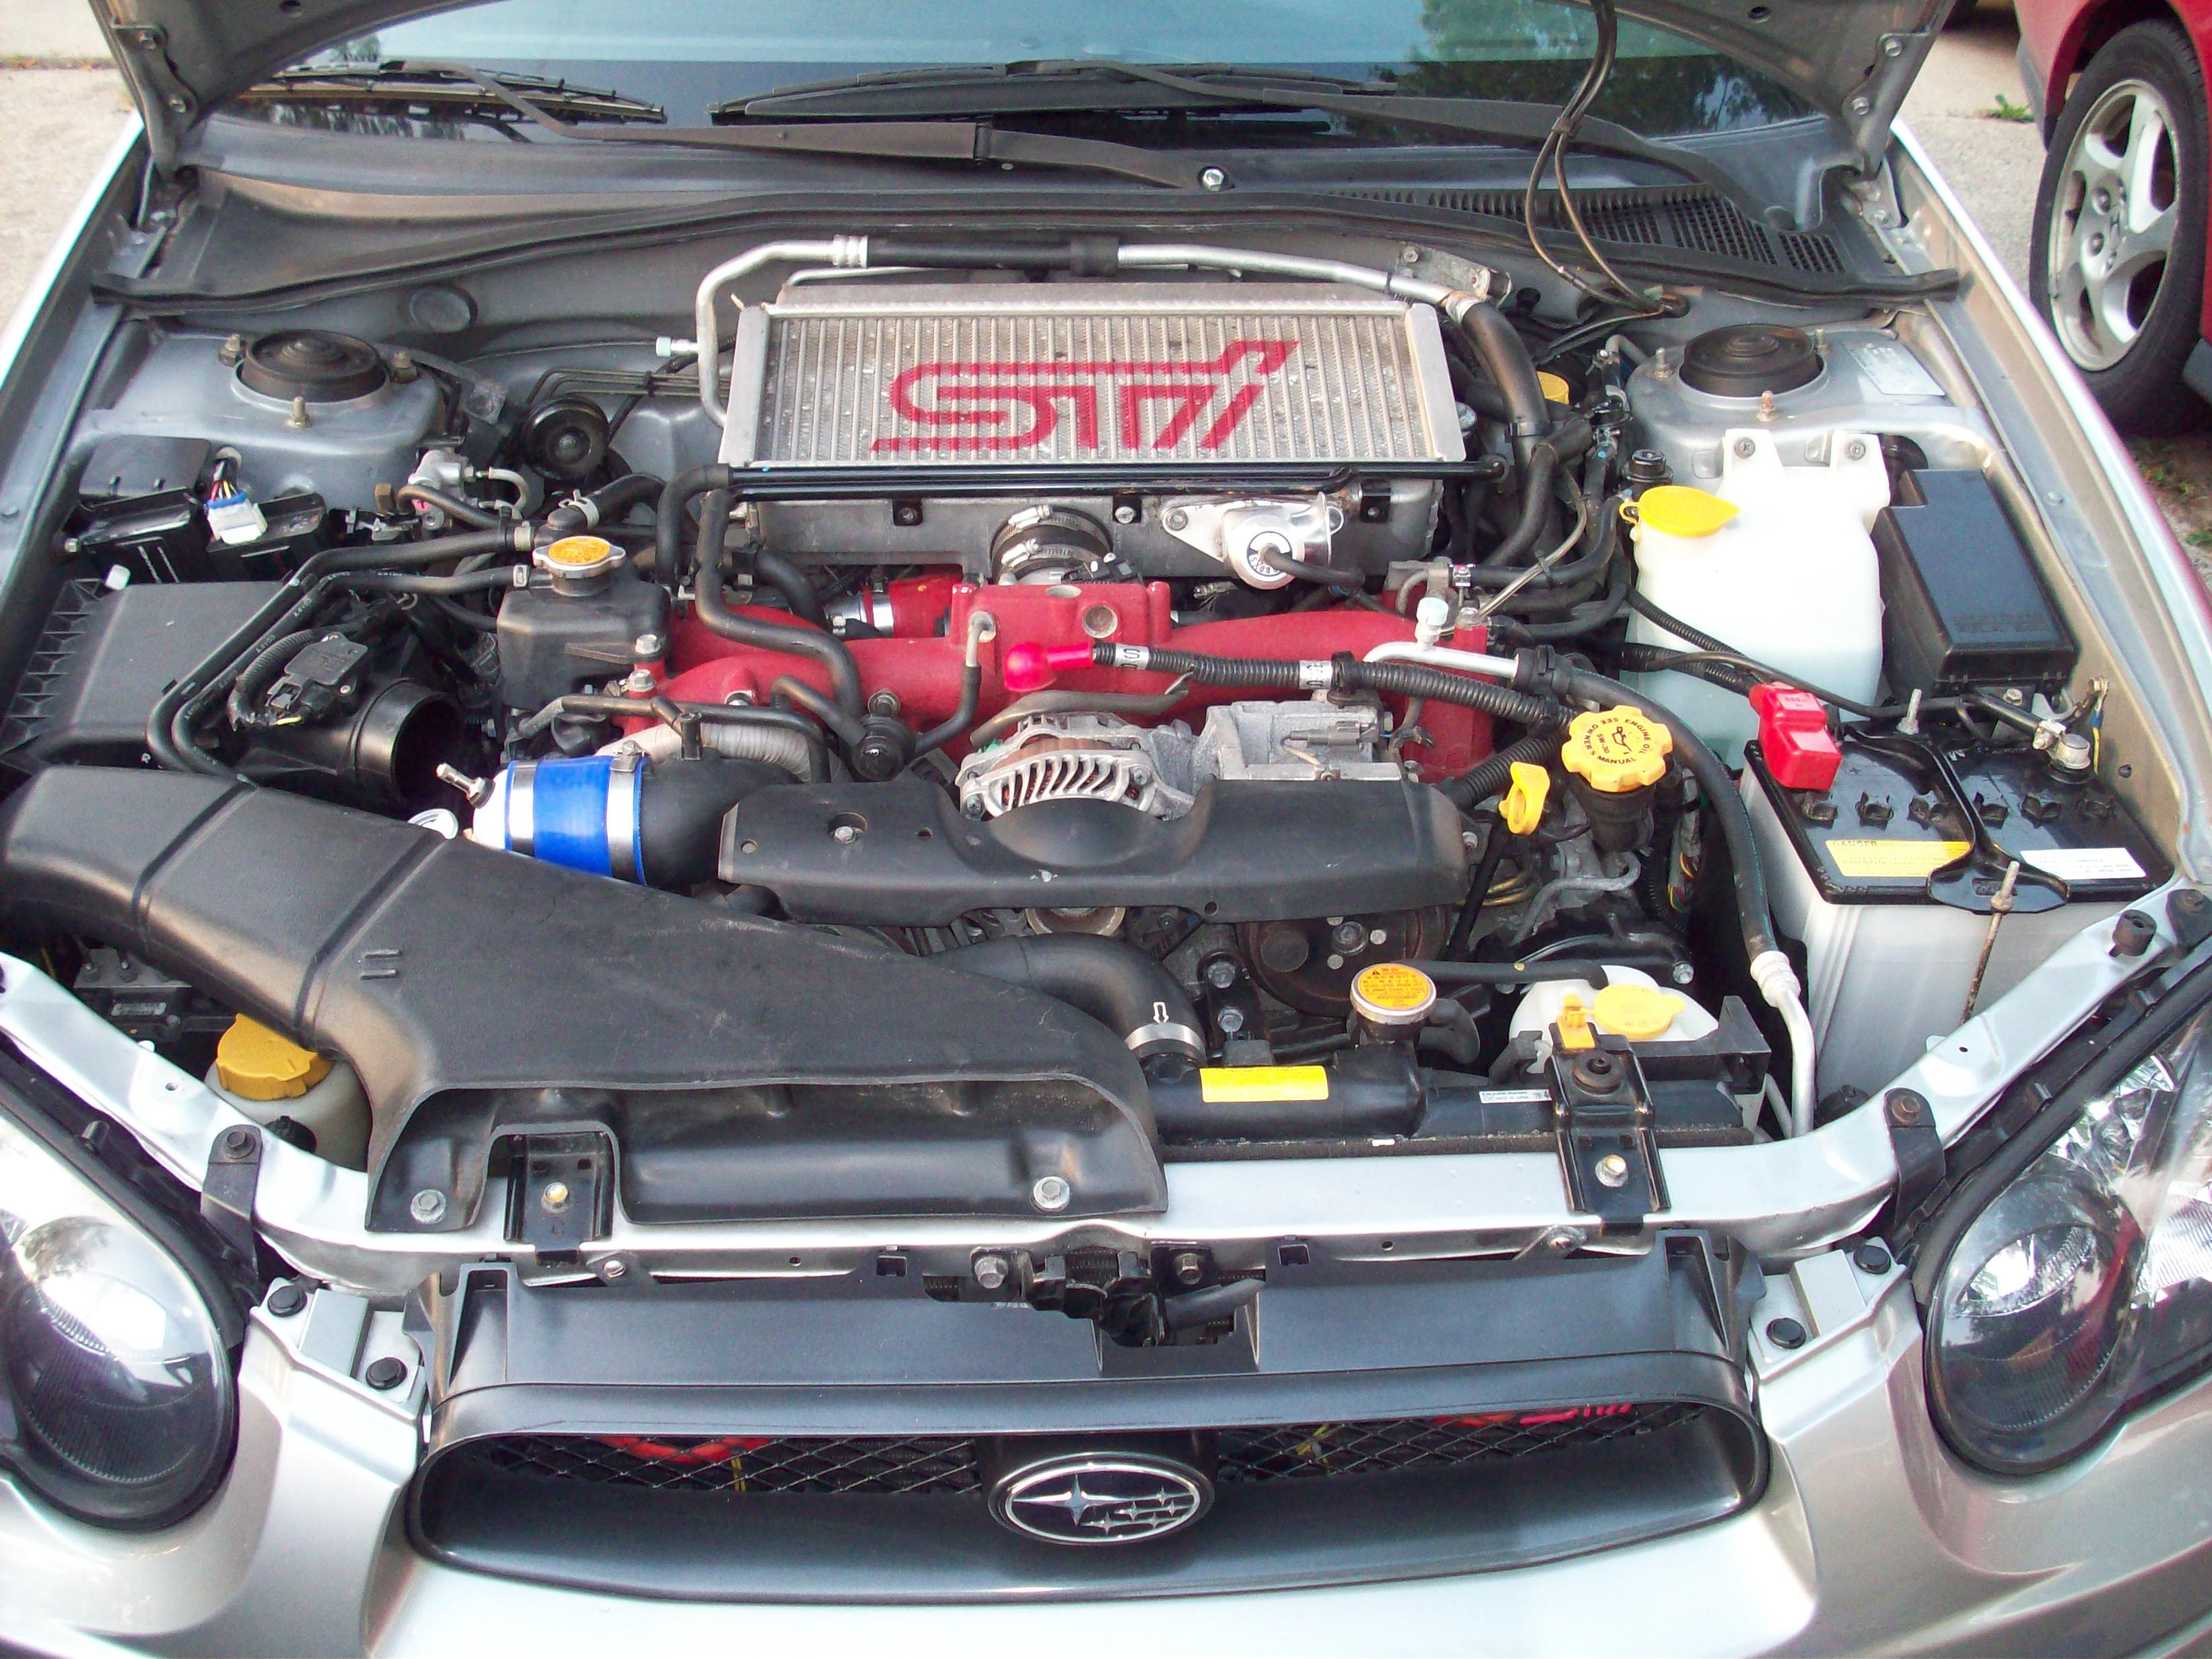 subaru1?t=1422674497 how to boostleak test a subaru Subaru Firing Order Diagram at gsmx.co